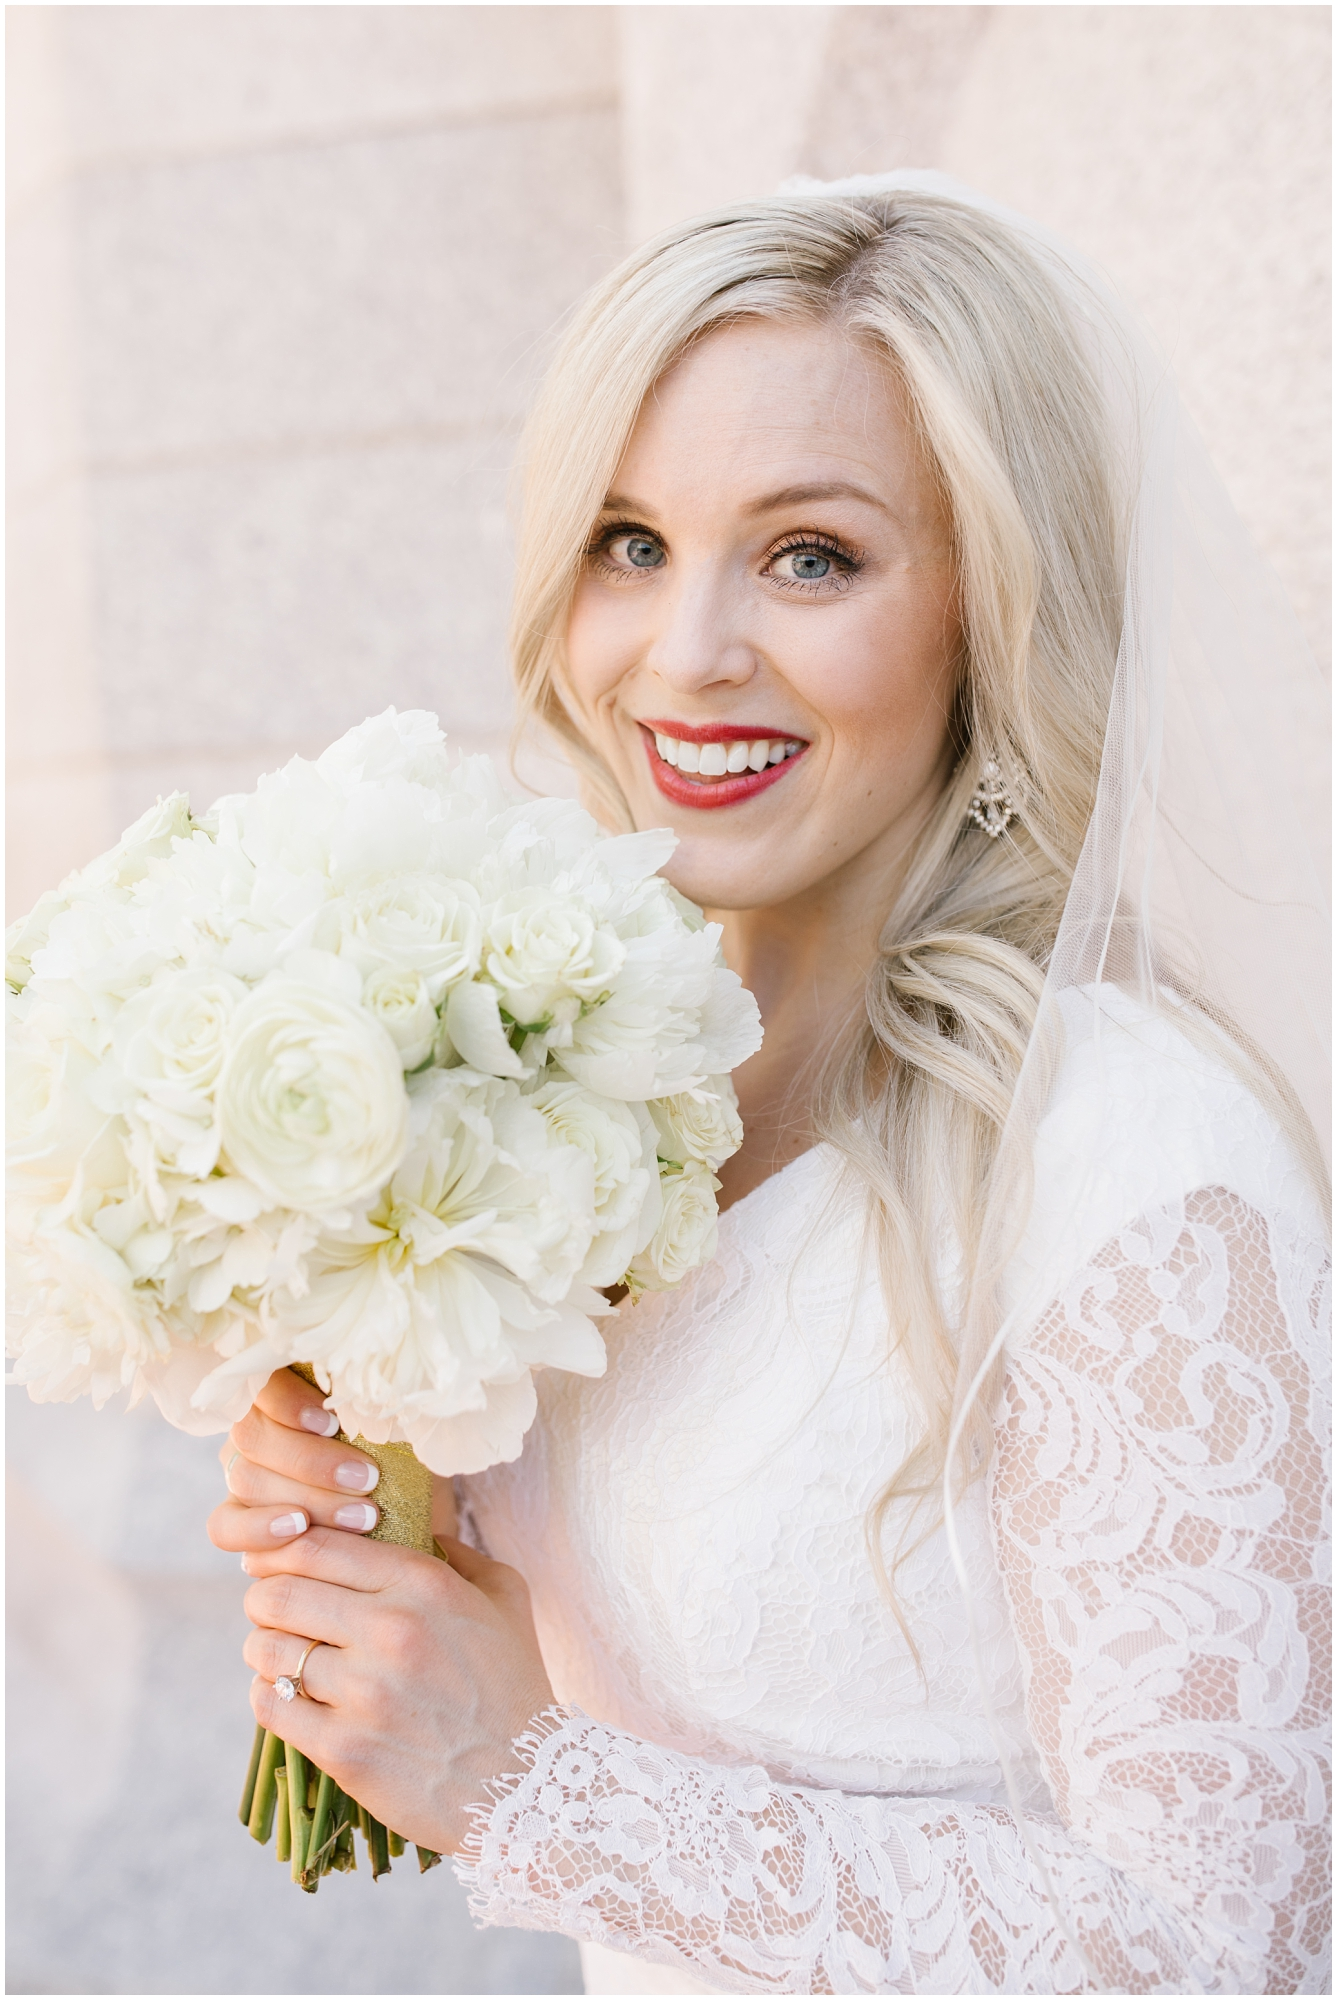 CherylandTyler-175_Lizzie-B-Imagery-Utah-Wedding-Photographer-Park-City-Salt-Lake-City-Temple-Wells-Fargo-Building.jpg